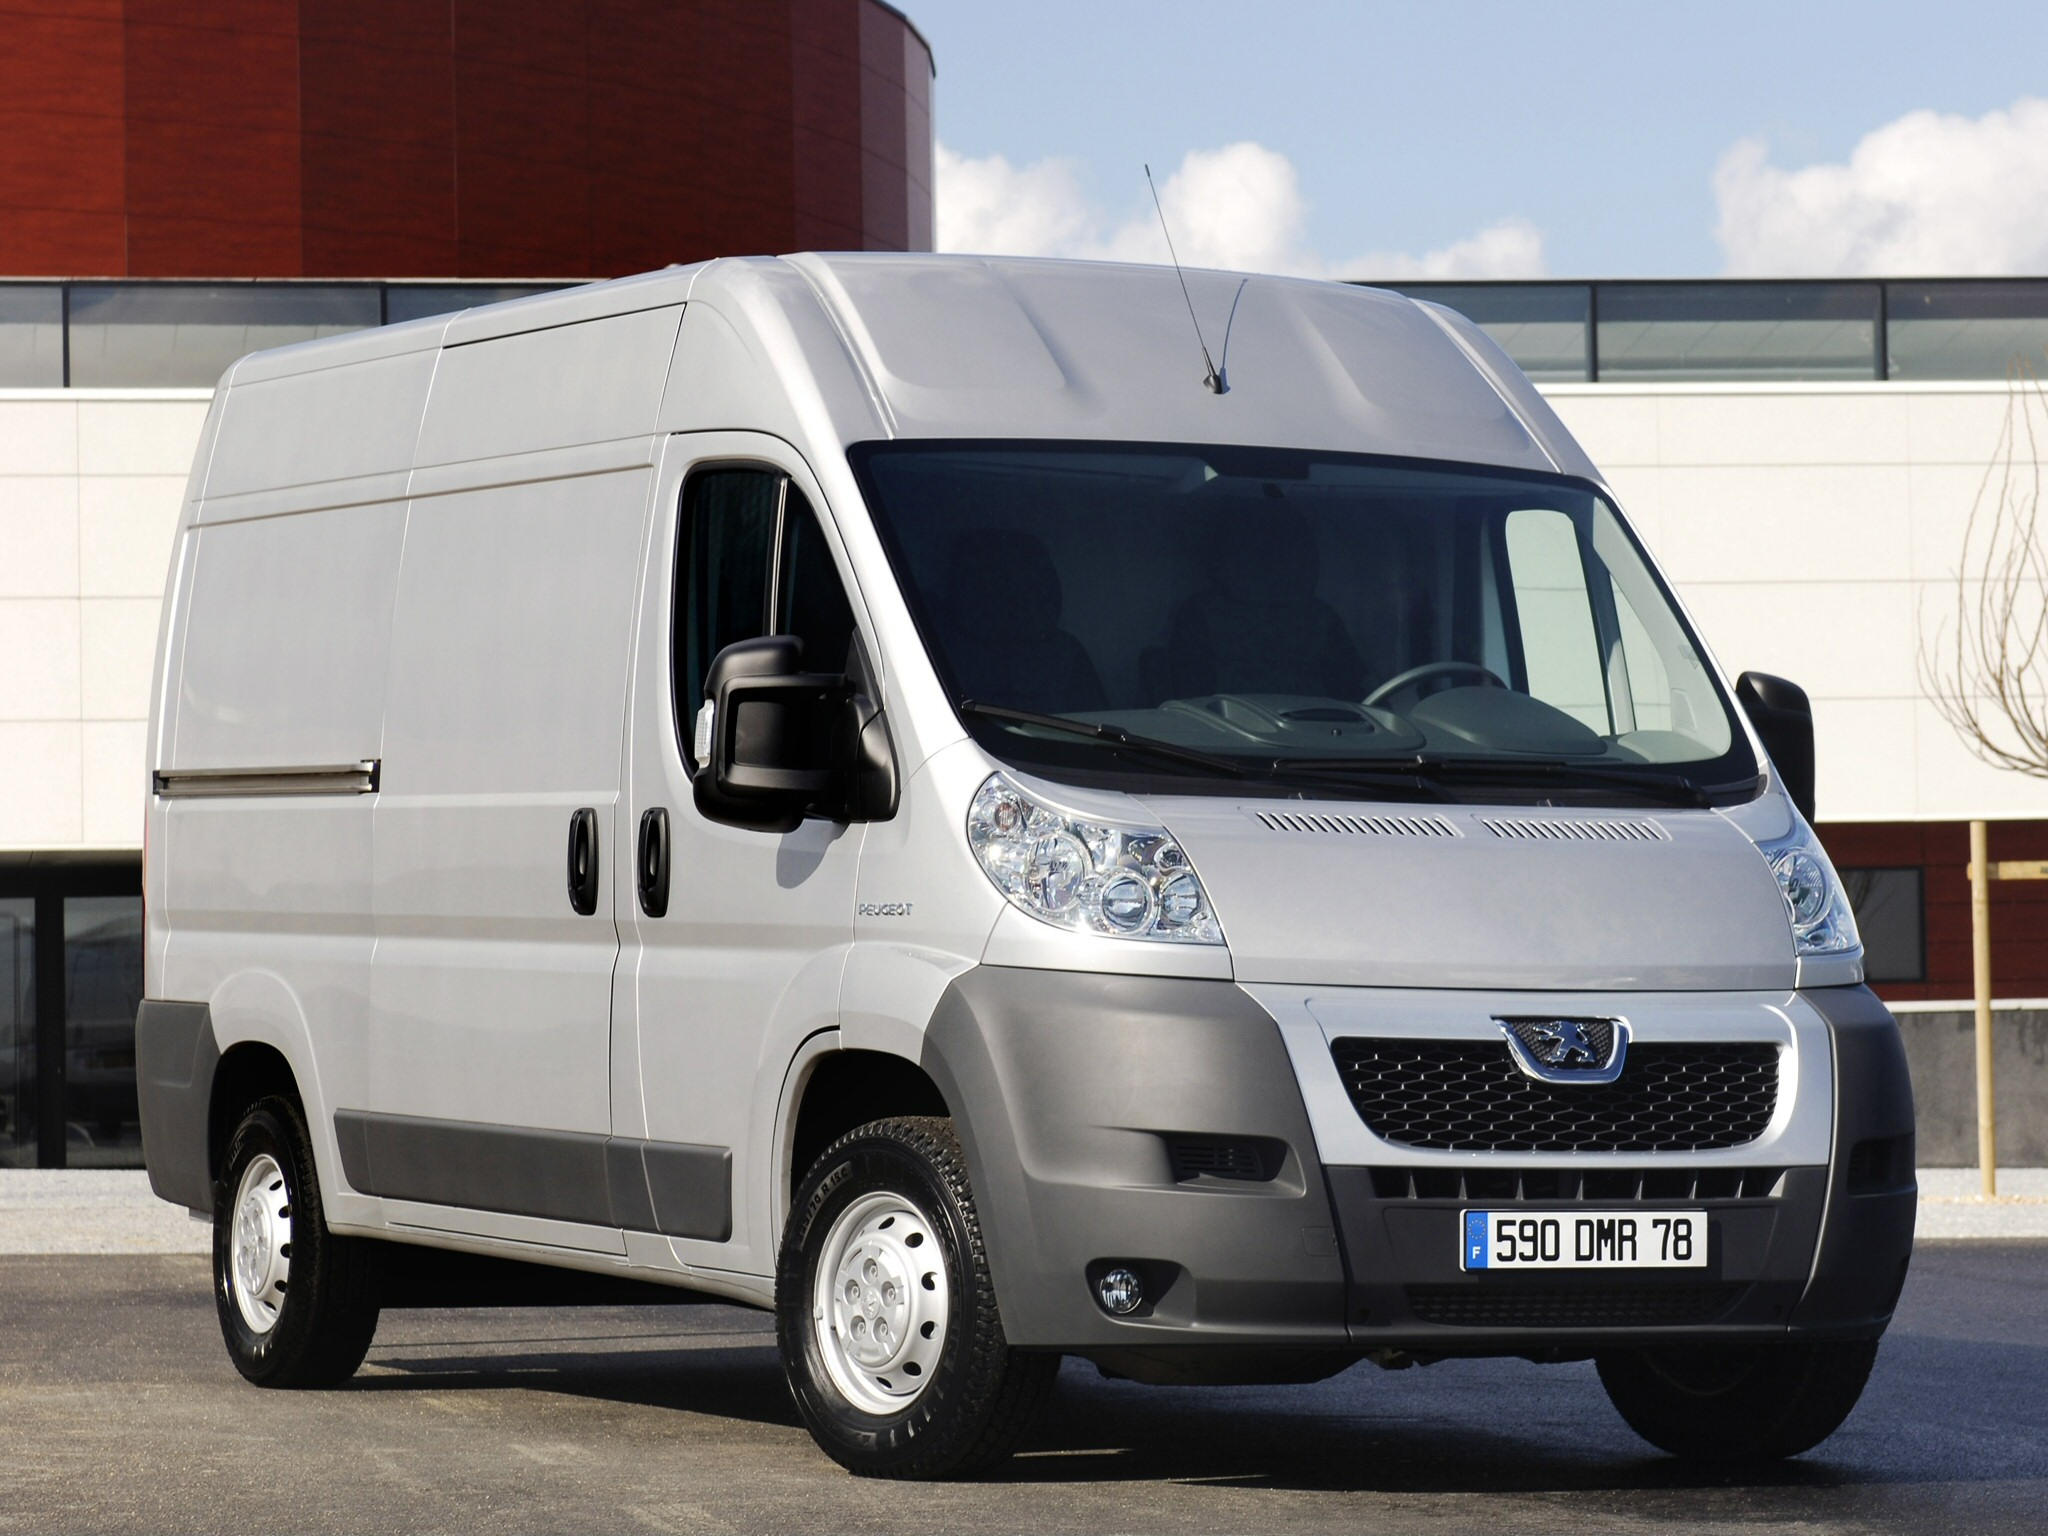 Peugeot Boxer Van for sale ebay glasgow free online image editor Wallpaper